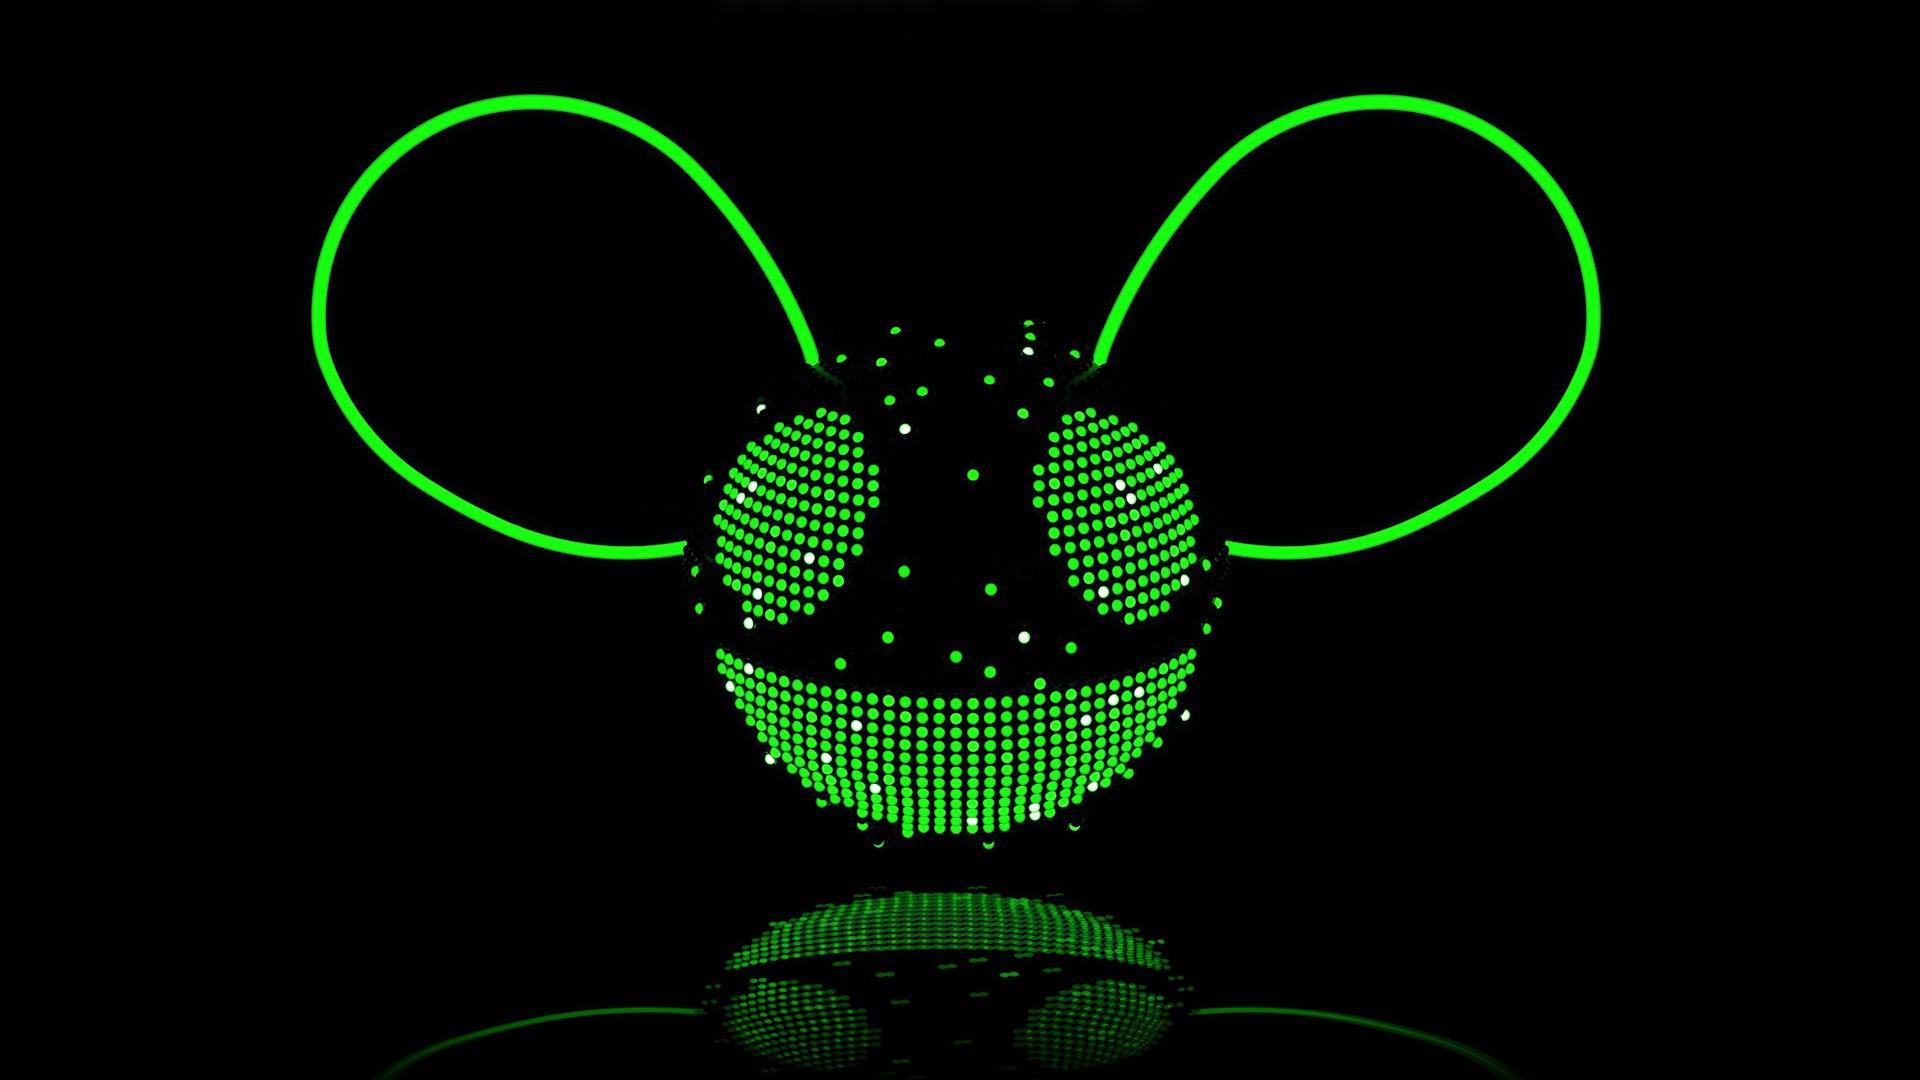 deadmau5 green wallpaper - photo #11